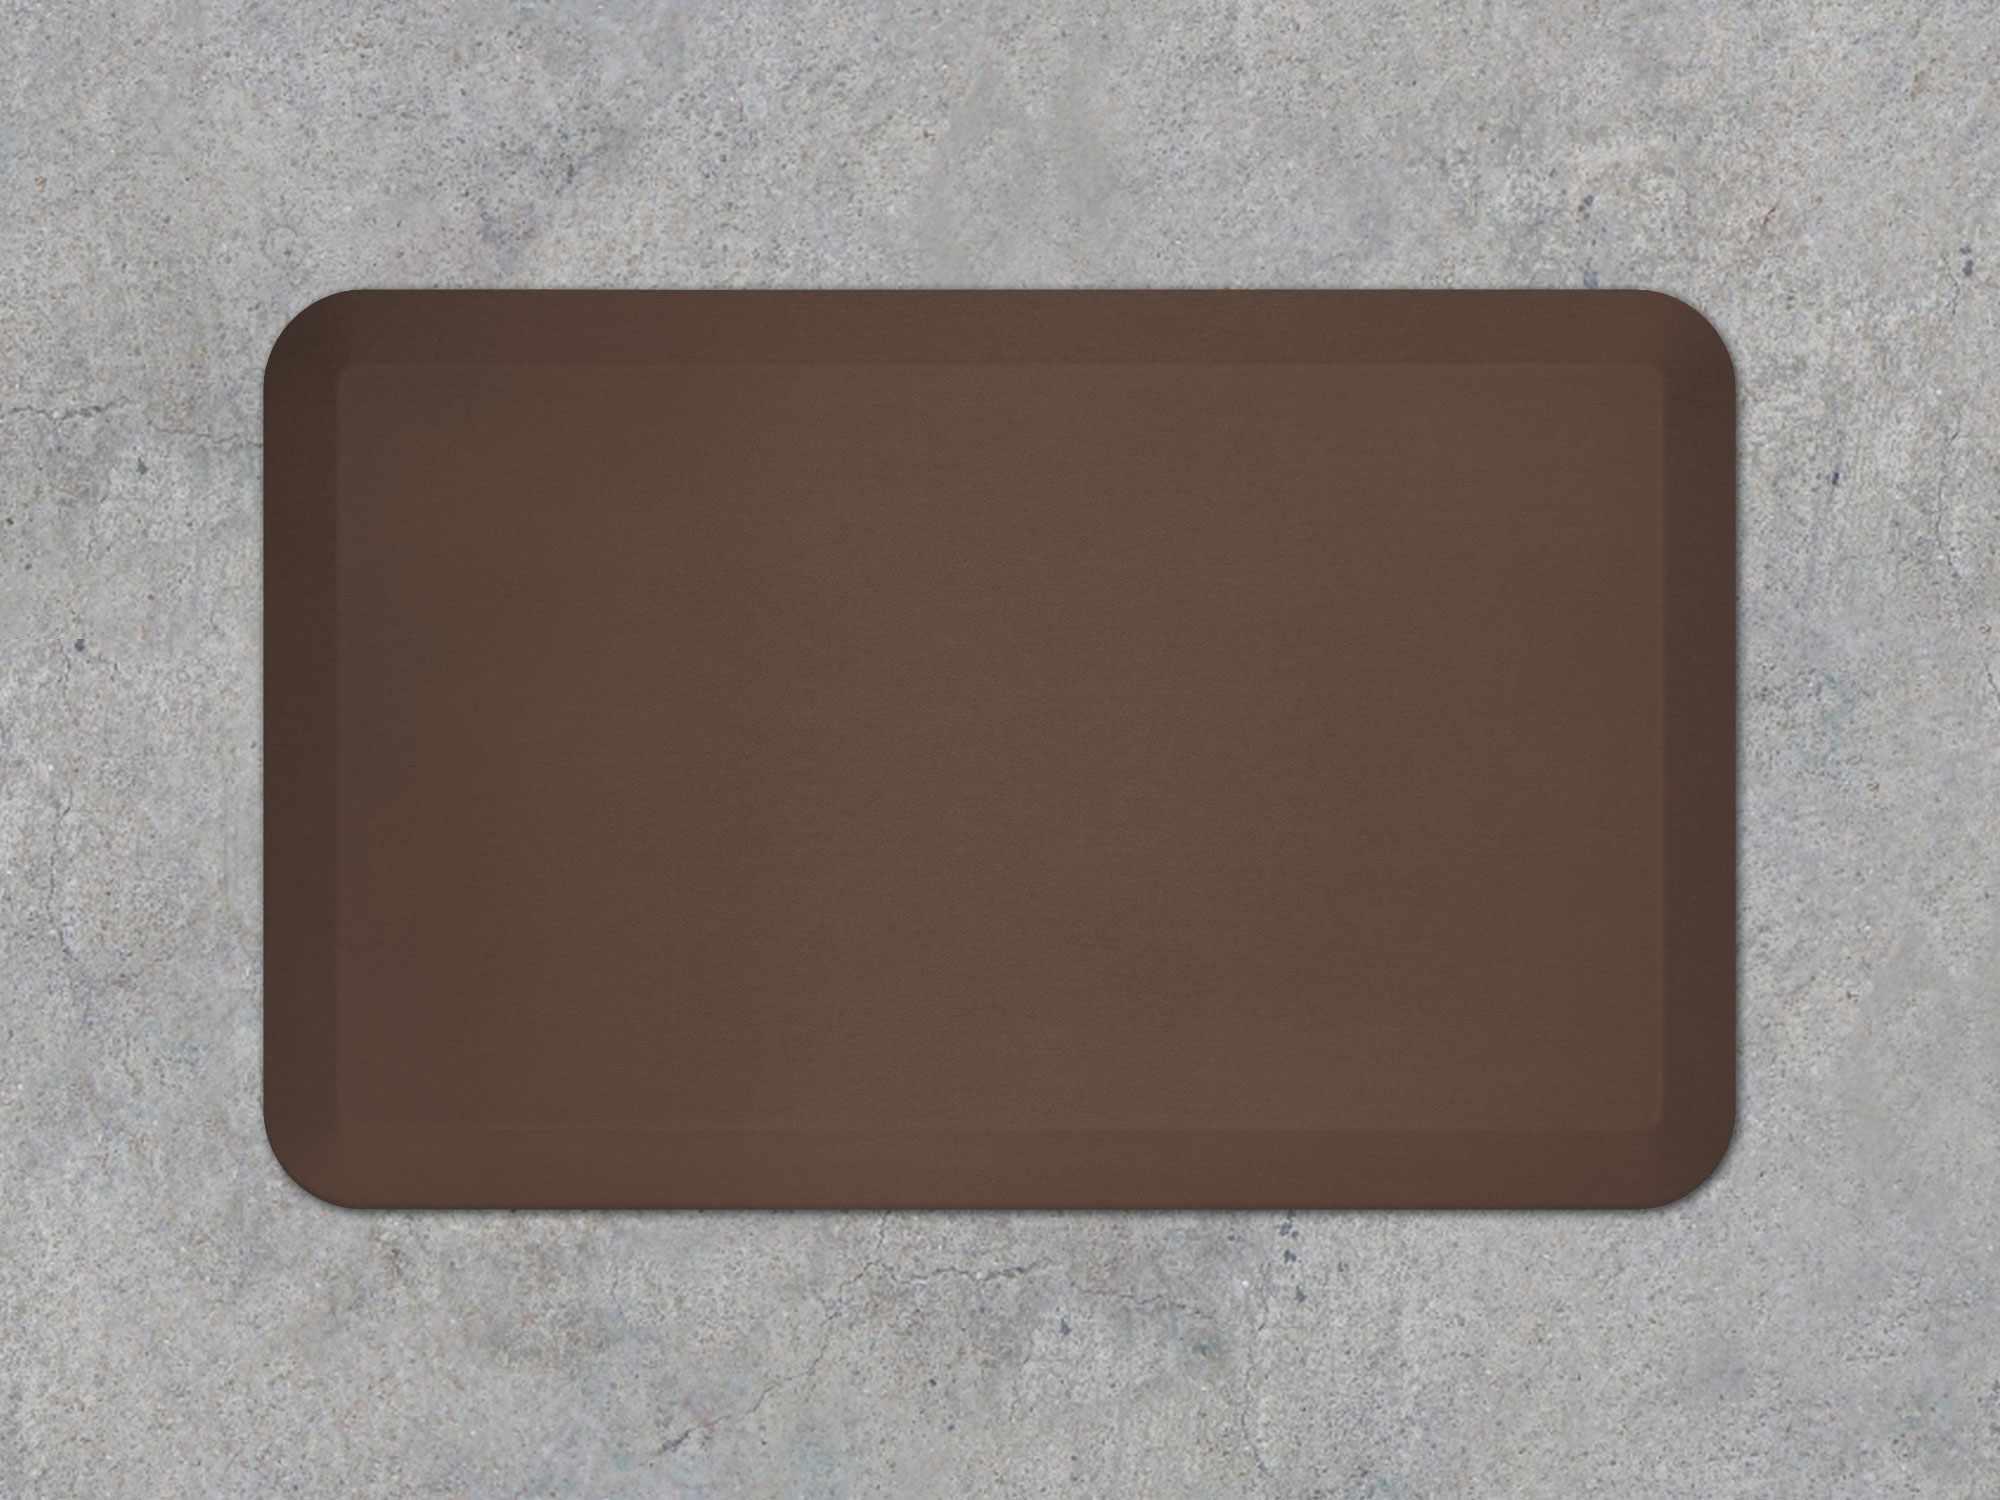 Commercial Mats Standing Desk Mats Newlife Eco Pro